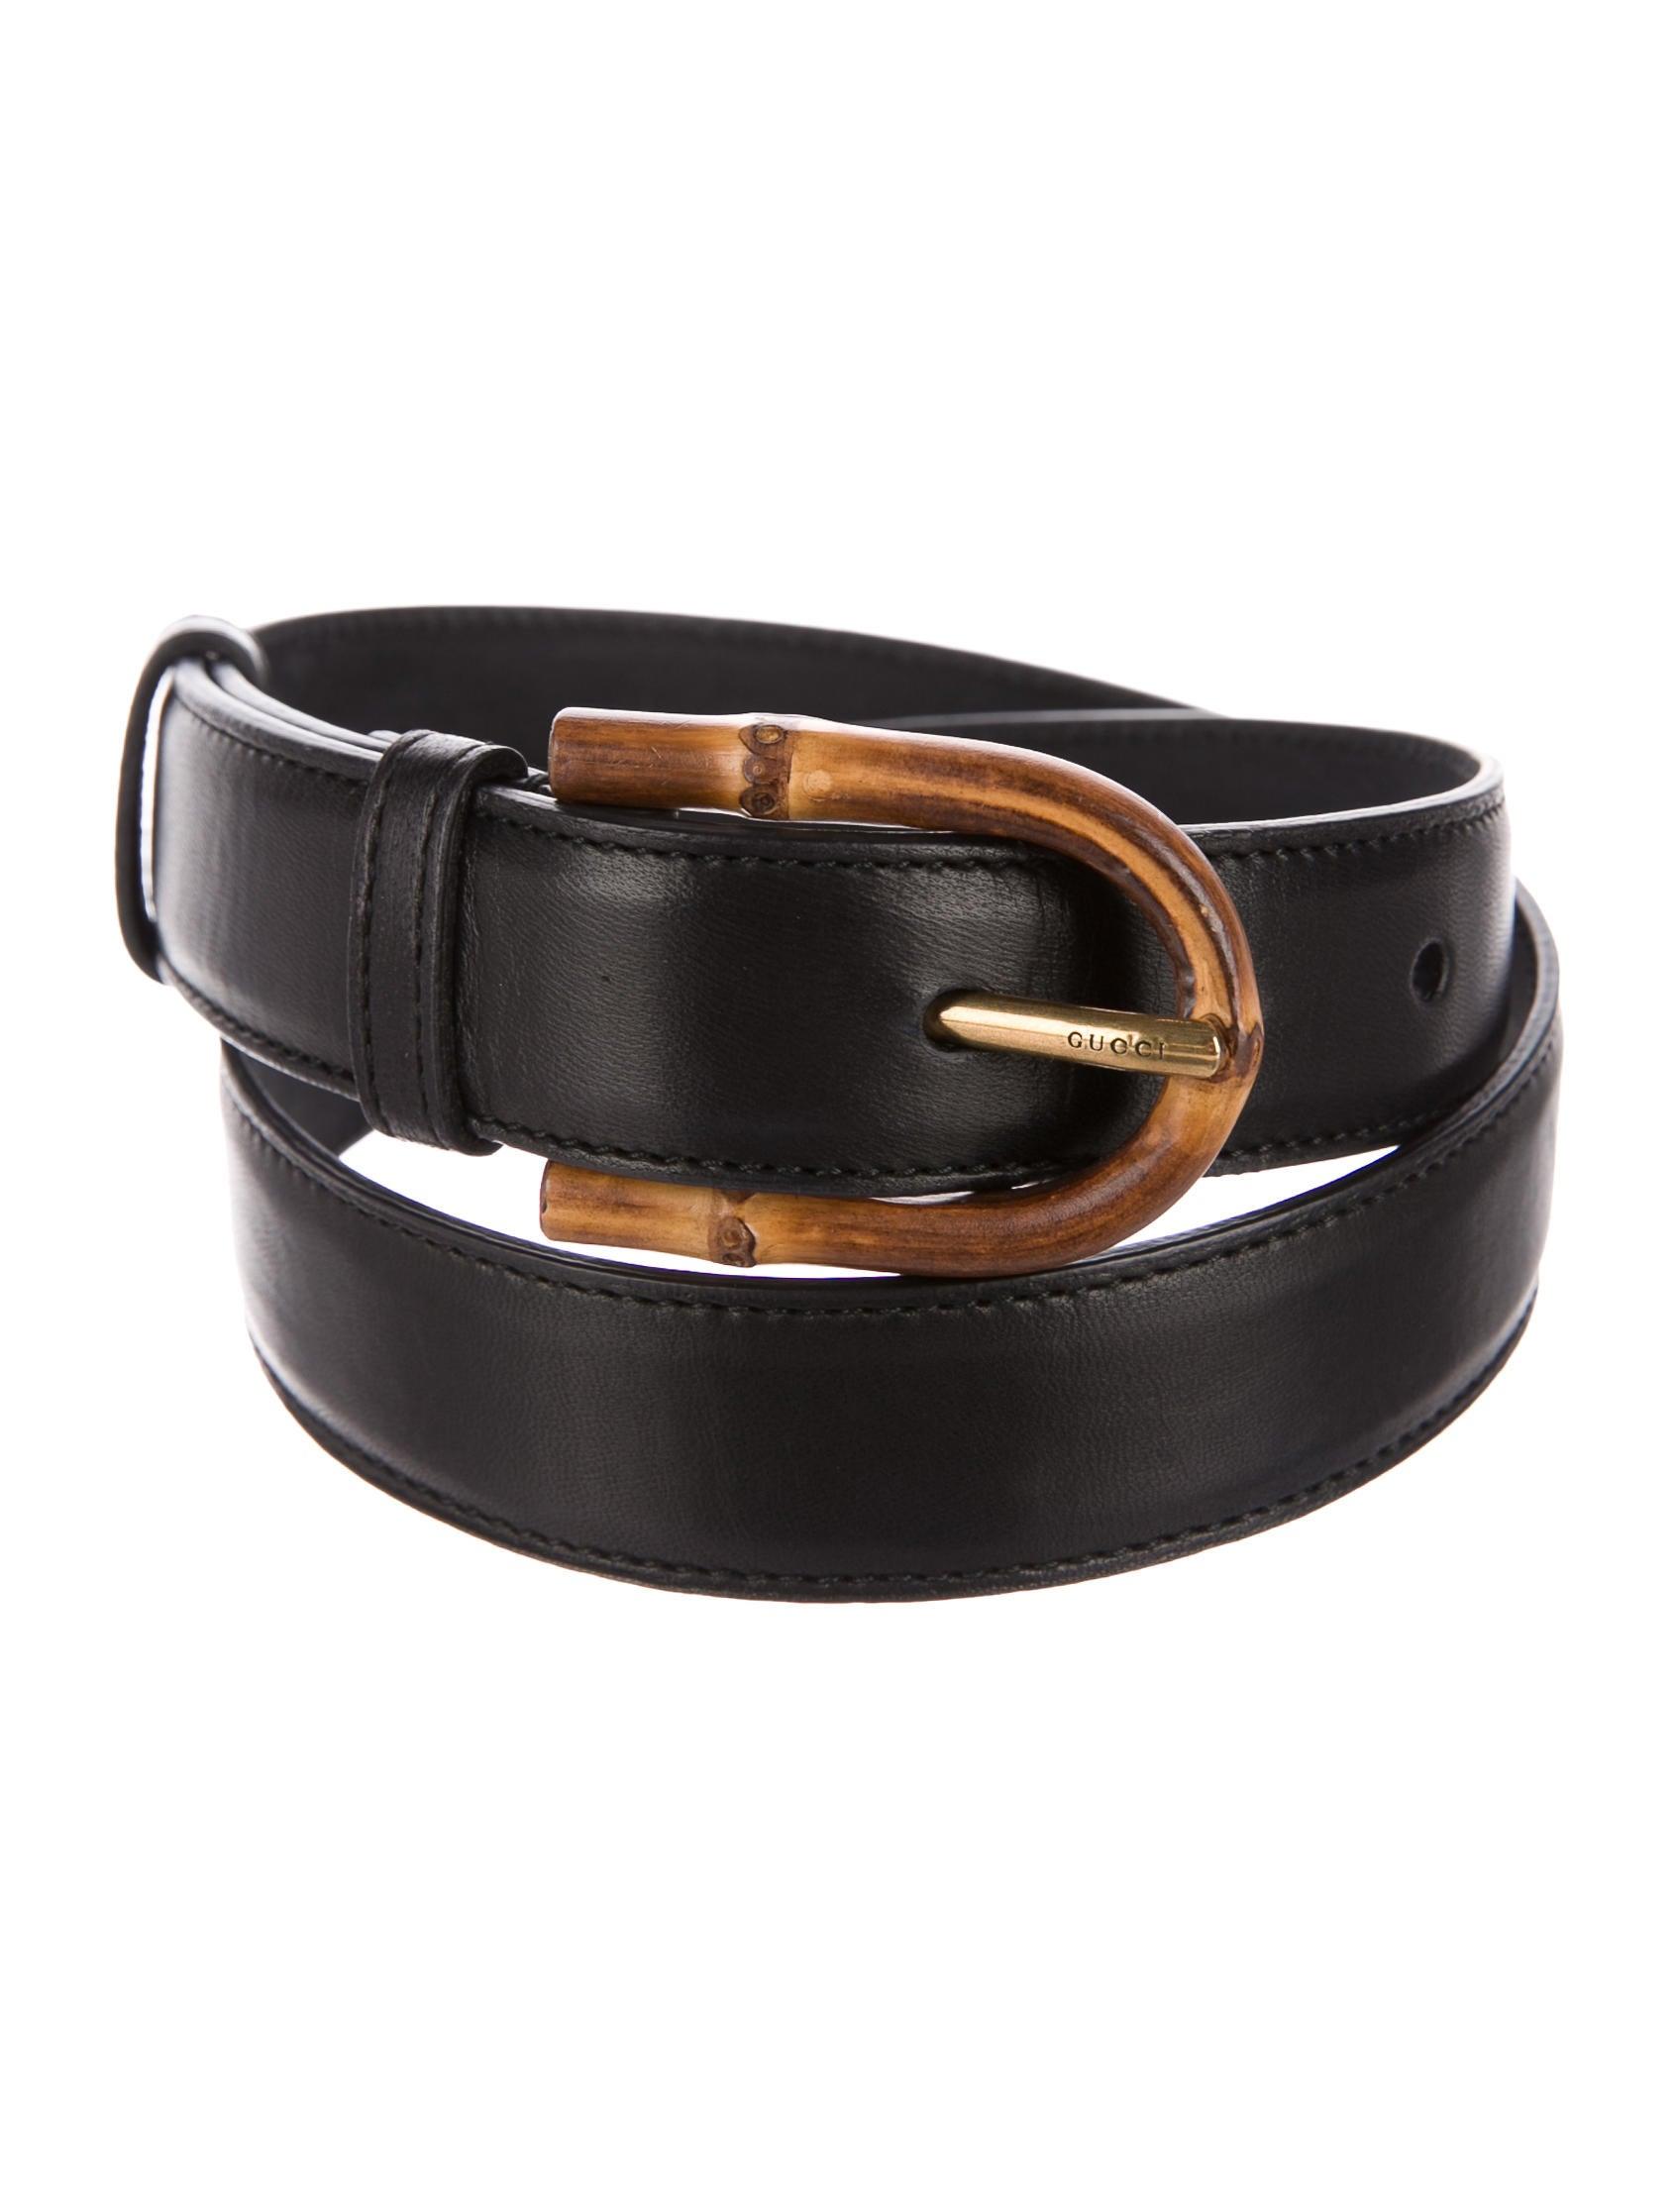 575a8c50ec0 Gucci Leather Bamboo Buckle Belt - Accessories - GUC165404